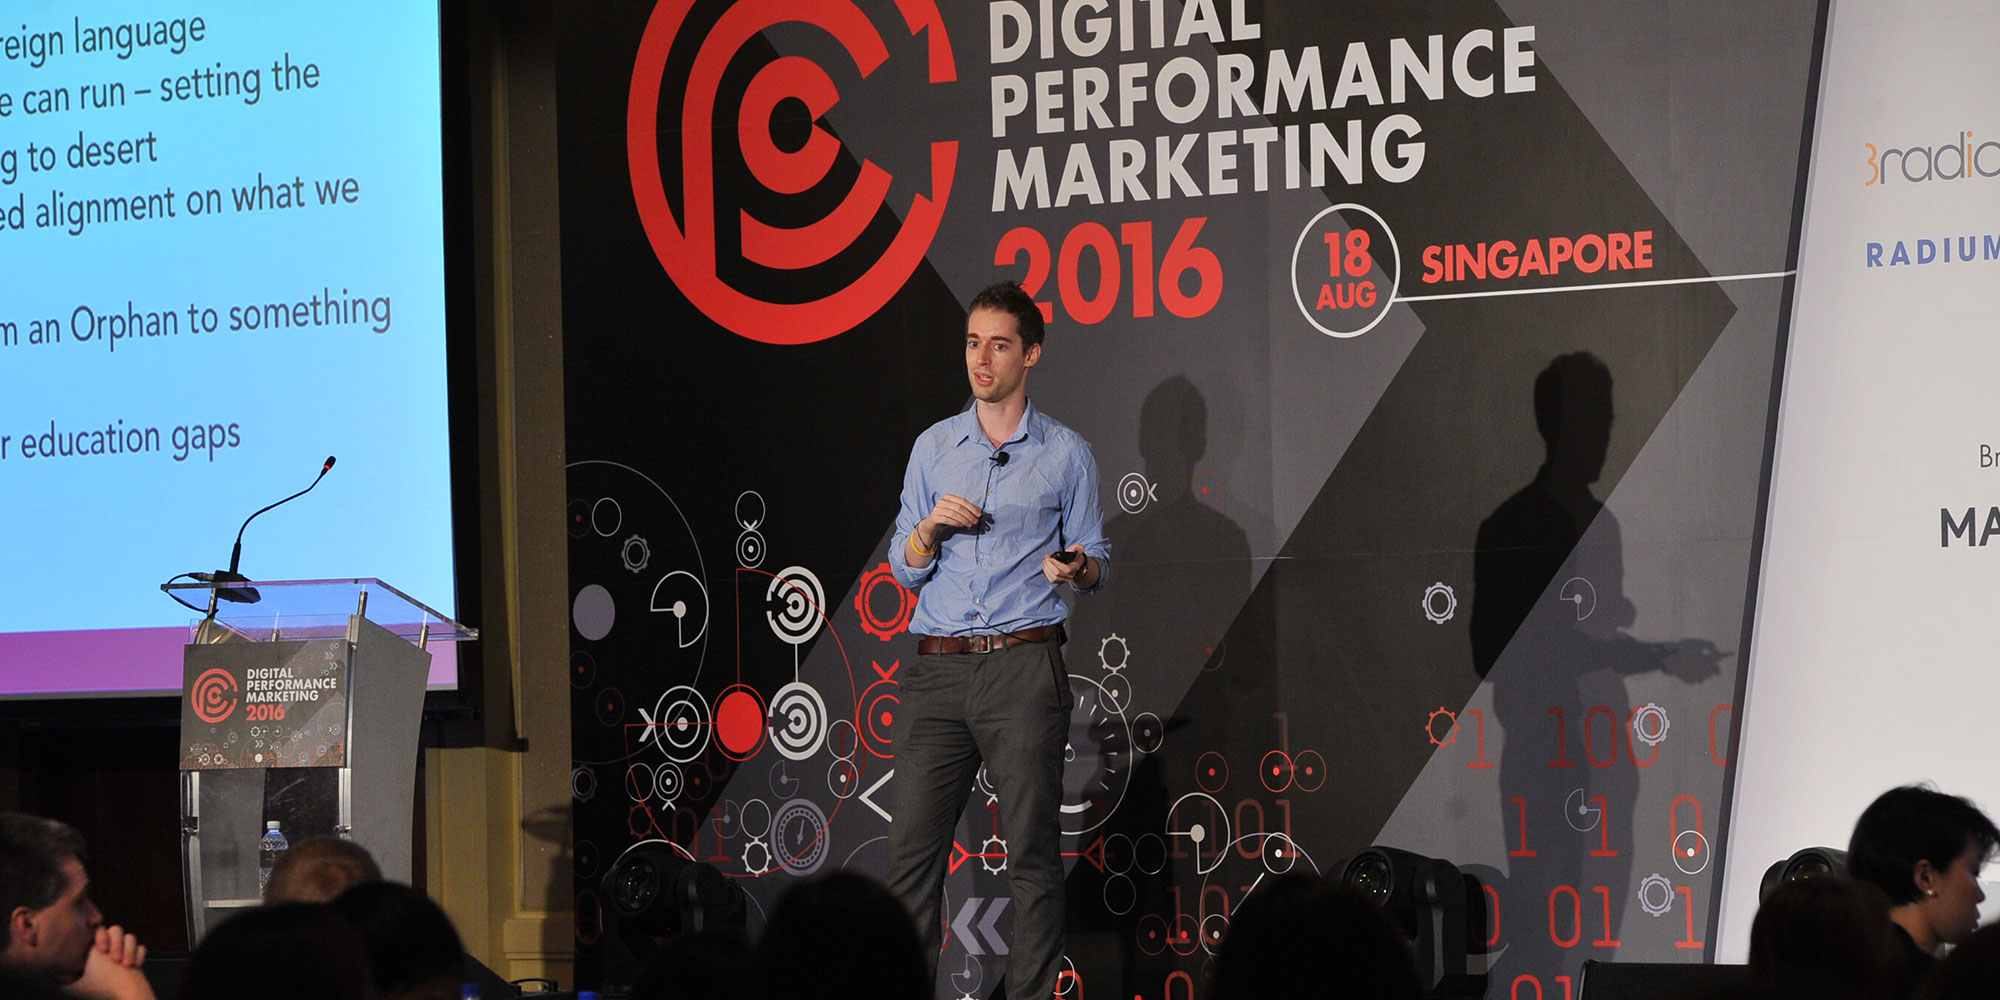 Digital Performance Marketing 2017